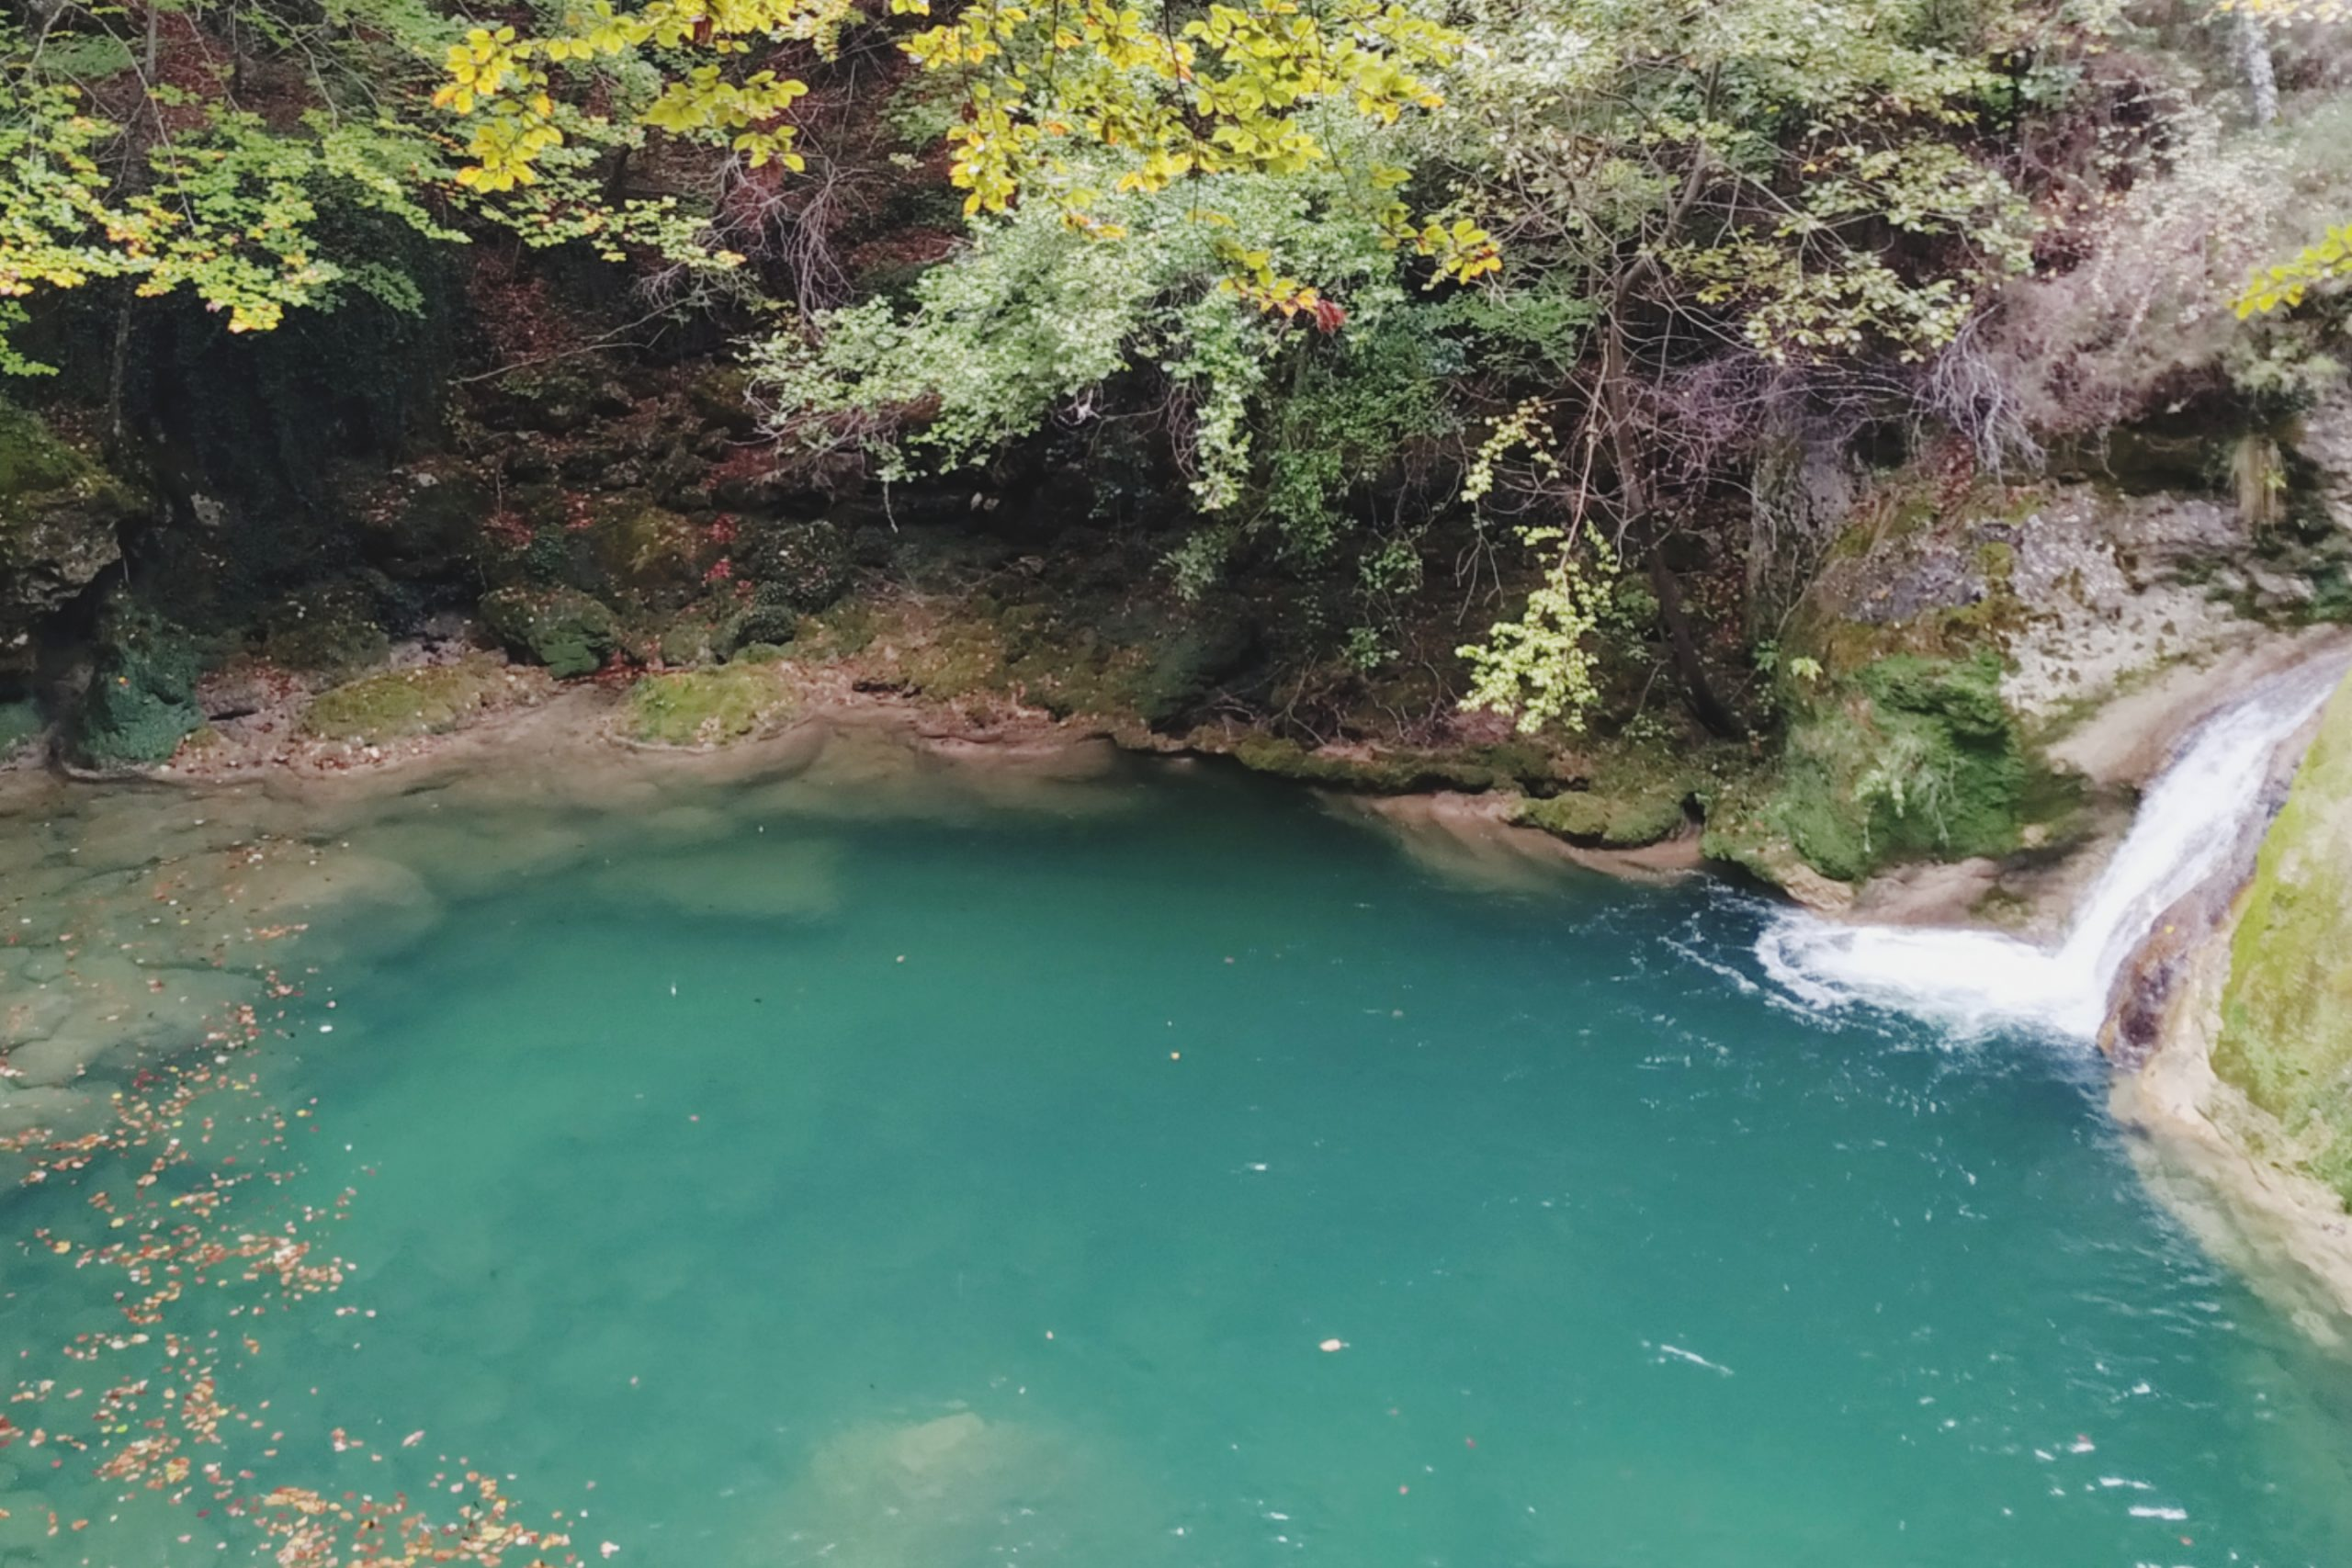 Aguas-turquesas-río-Urredera